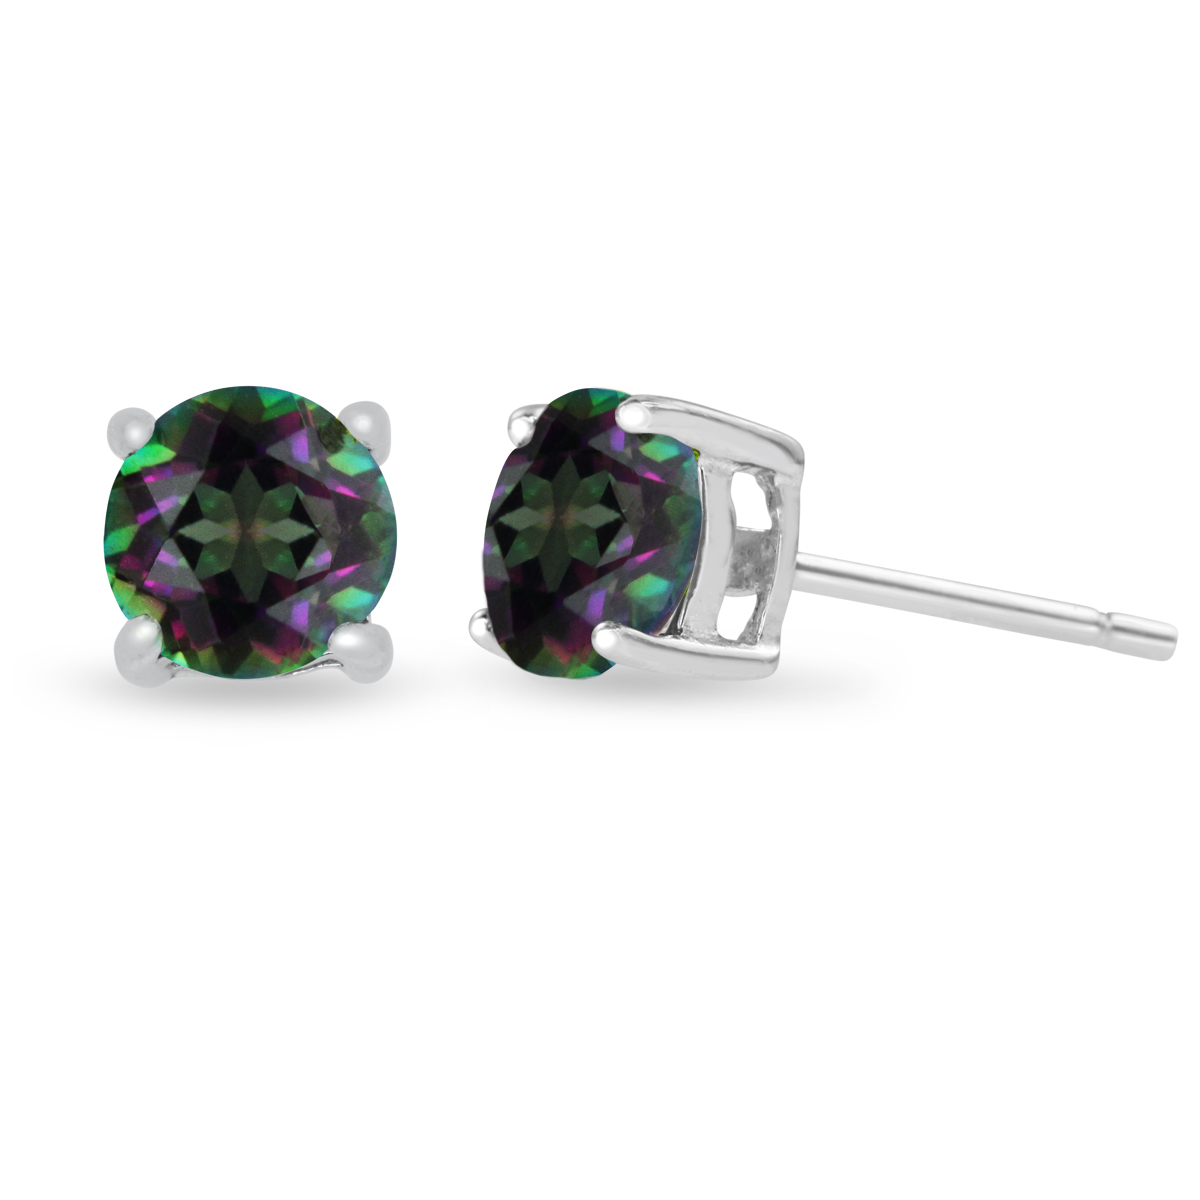 2ct Round Rainbow Amethyst Earrings